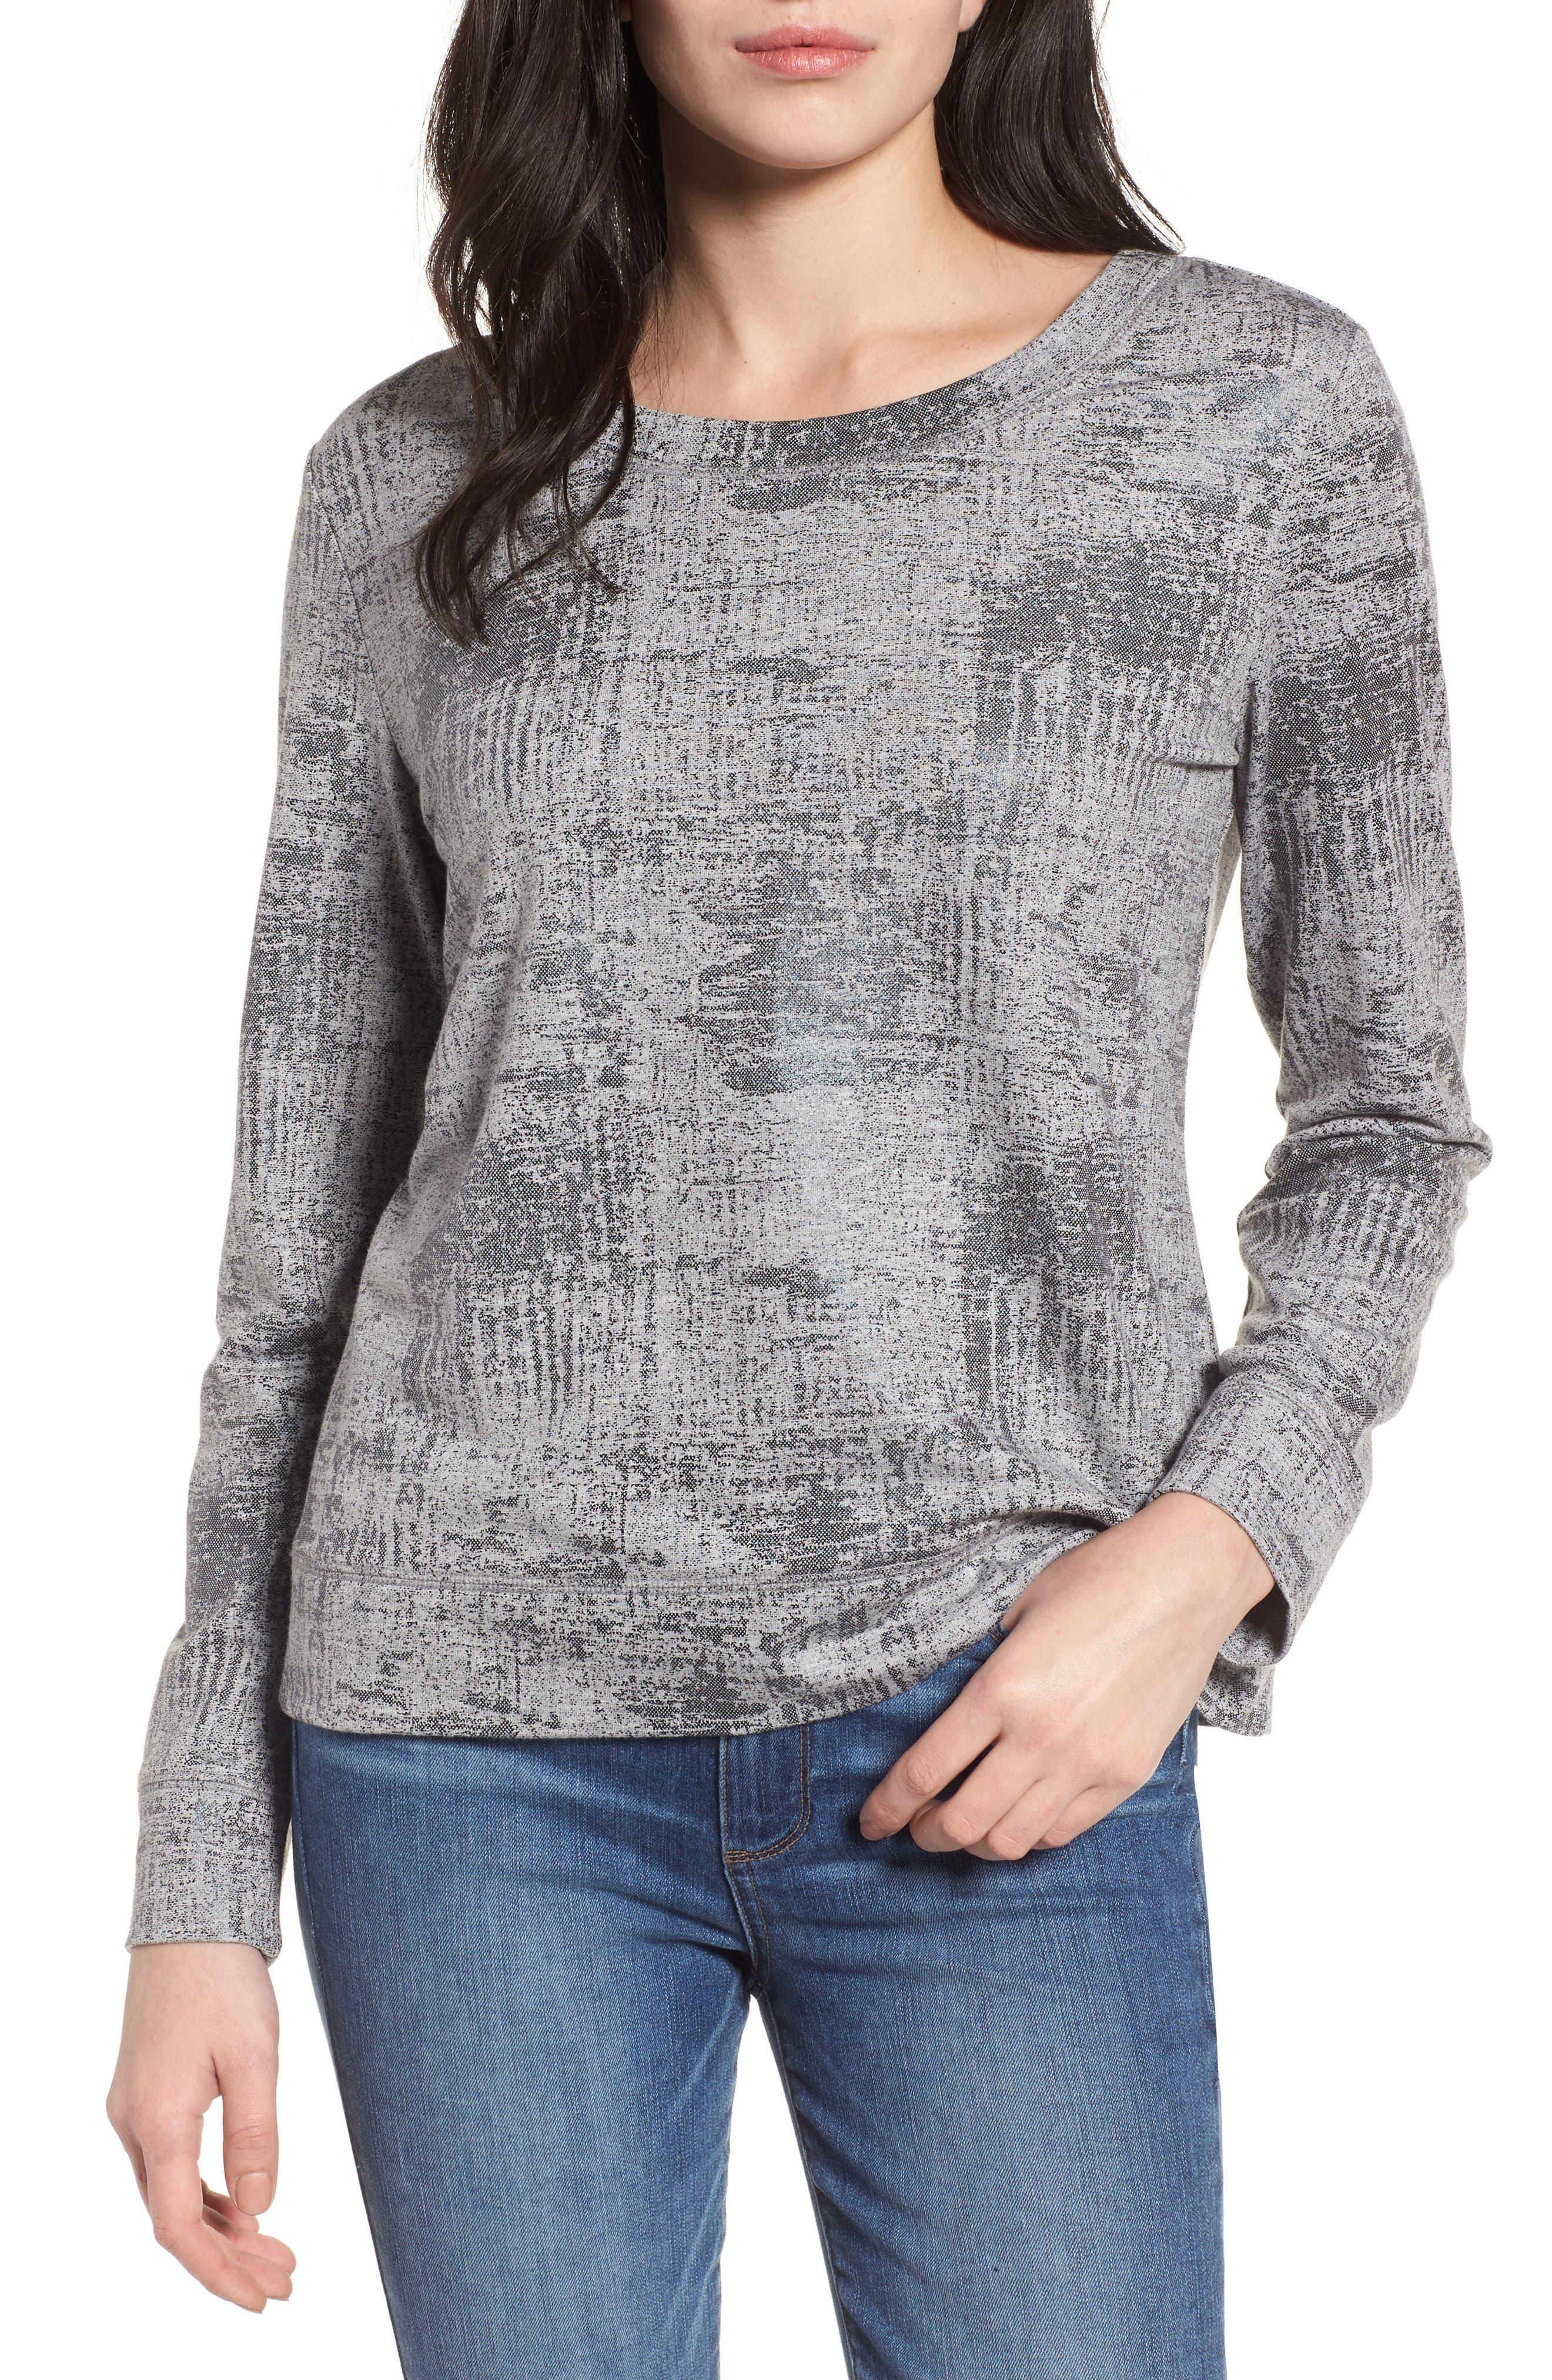 Foiled Sweatshirt,                         Main,                         color, Grey- Black Foil